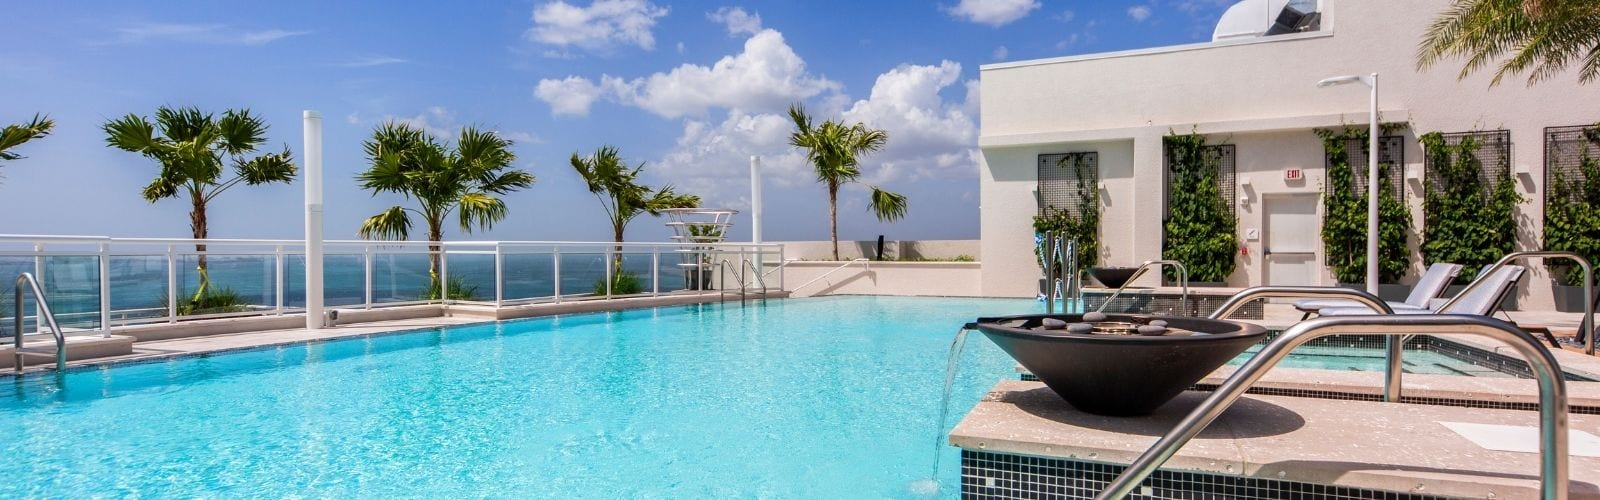 blvd sarasota rooftop blue pool